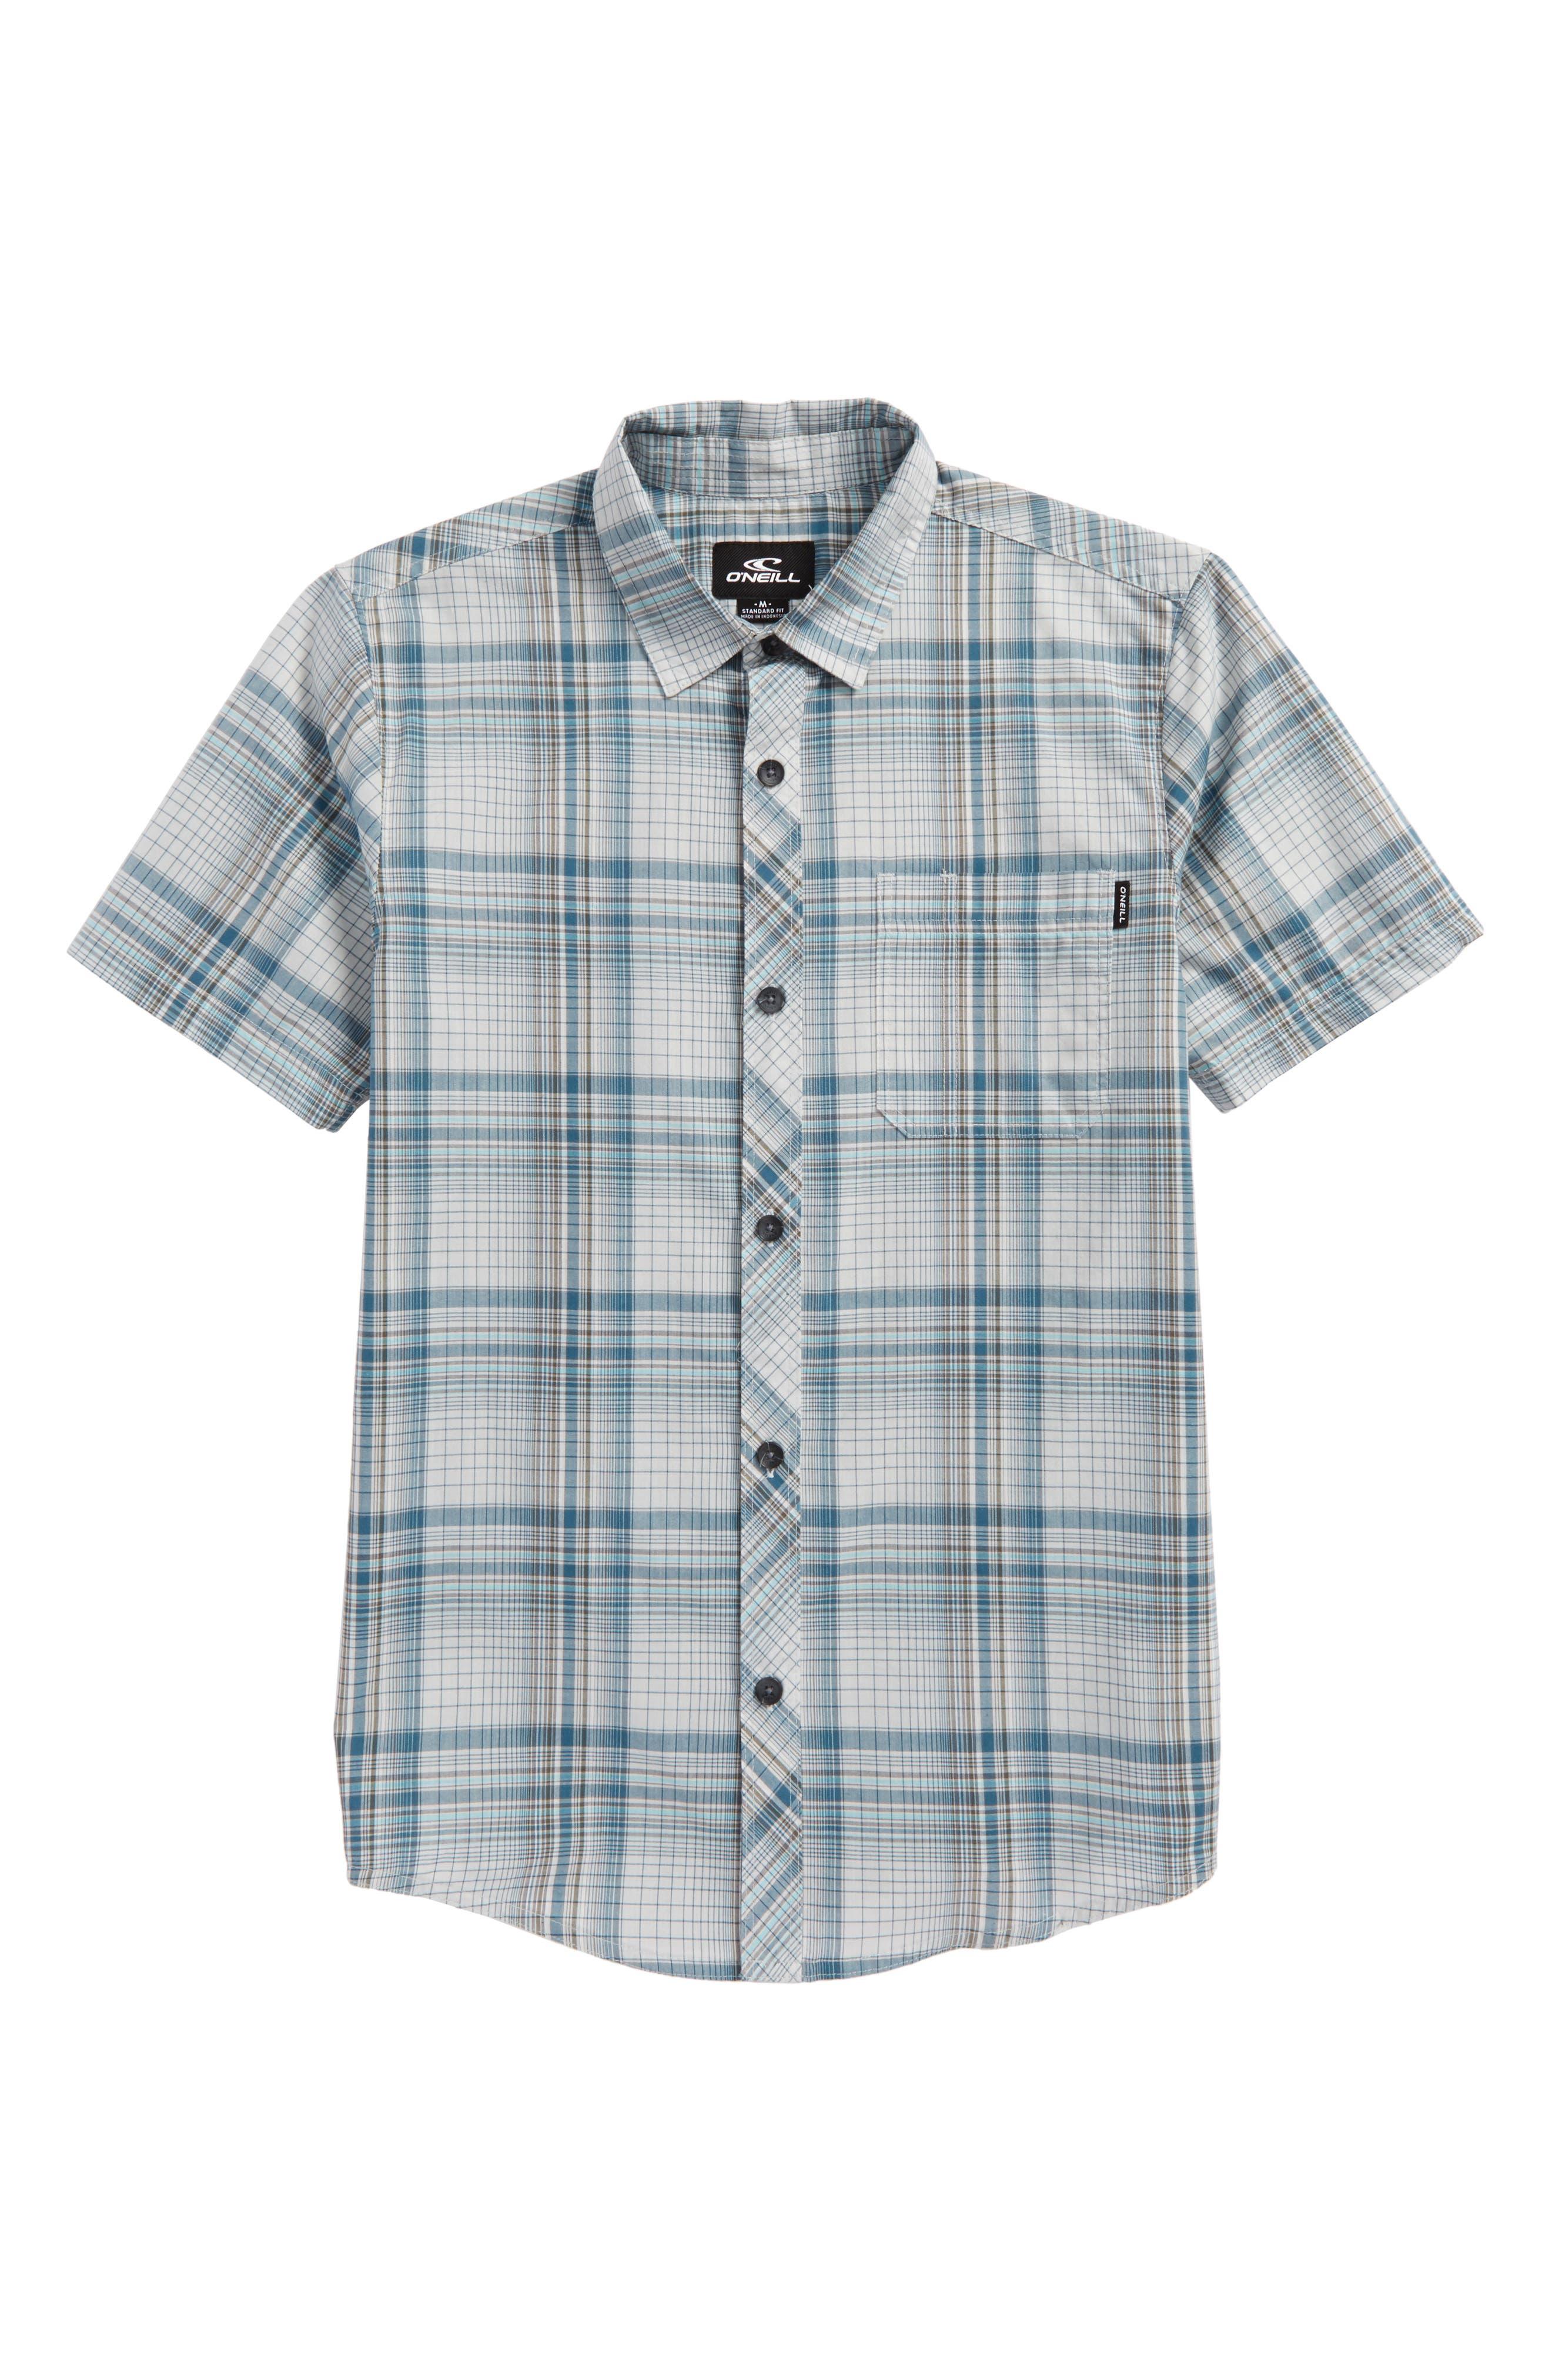 Sturghill Plaid Woven Shirt,                             Main thumbnail 1, color,                             Fog